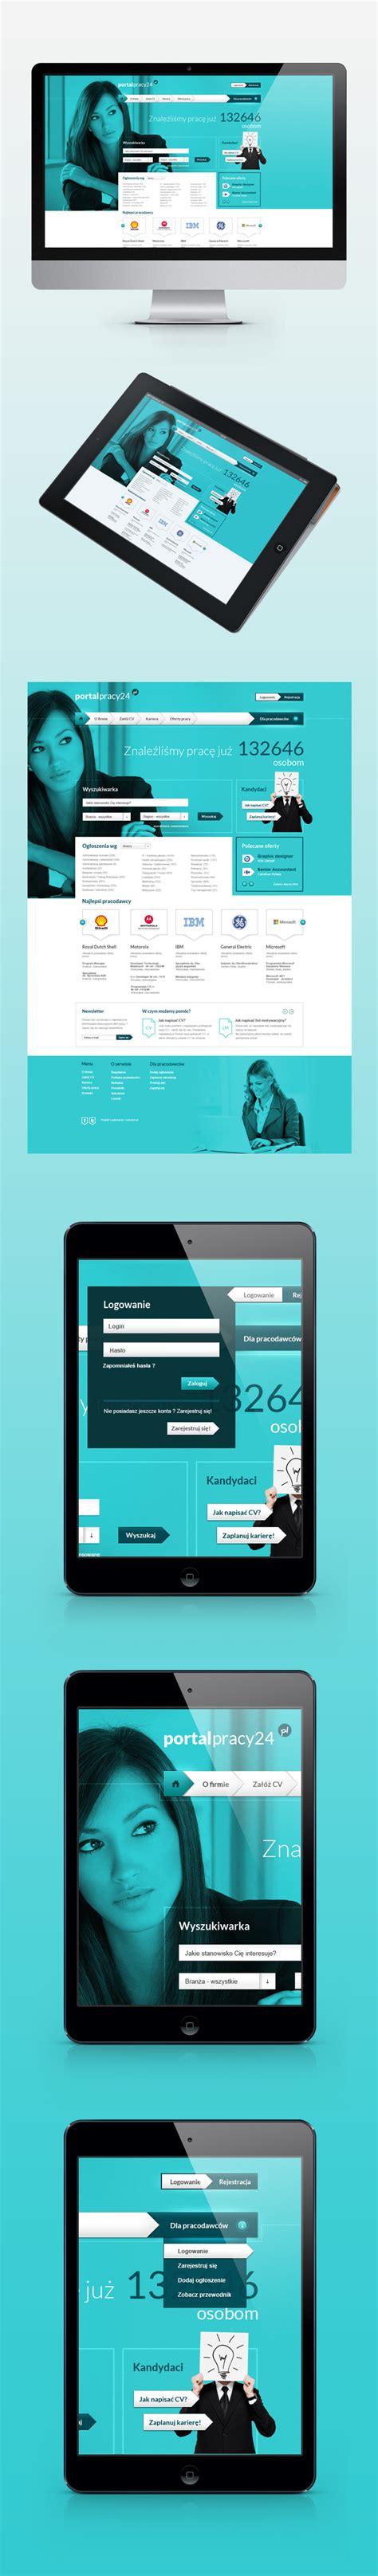 web design layout jobs portalpracy24 pl job portal by adam rozmus via behance